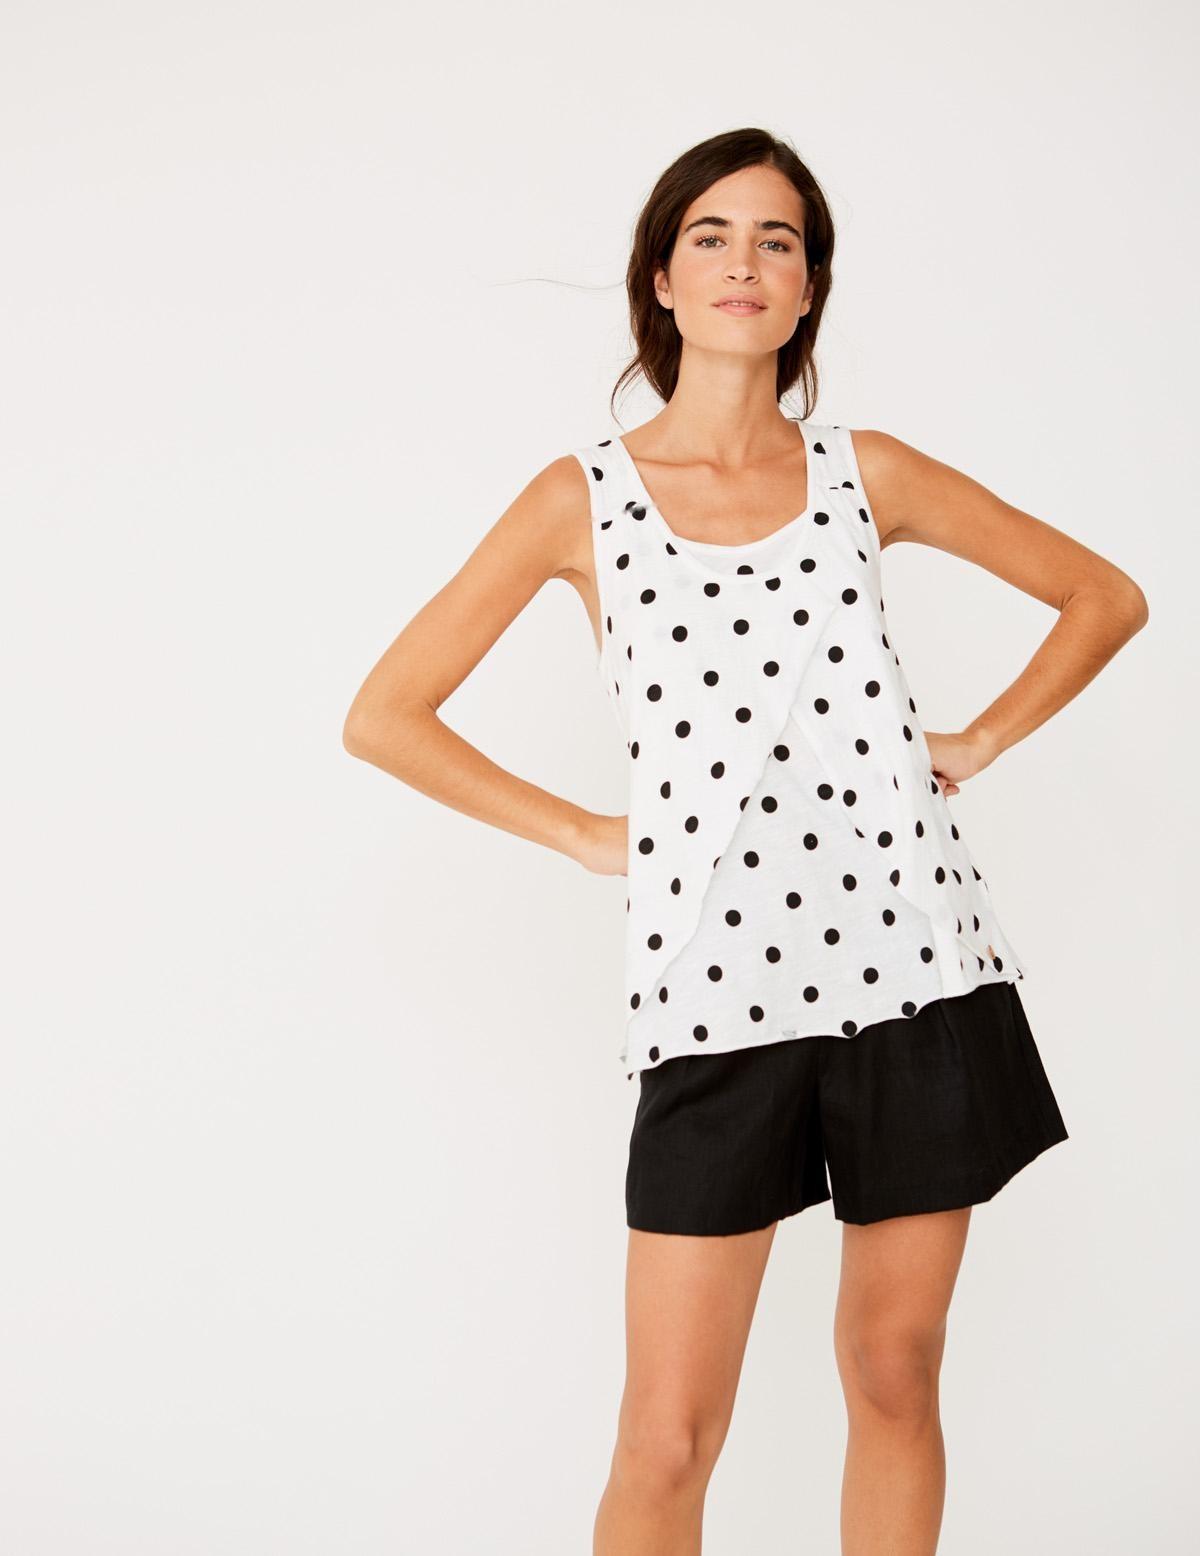 Camiseta topos algodón orgánico - Ítem2